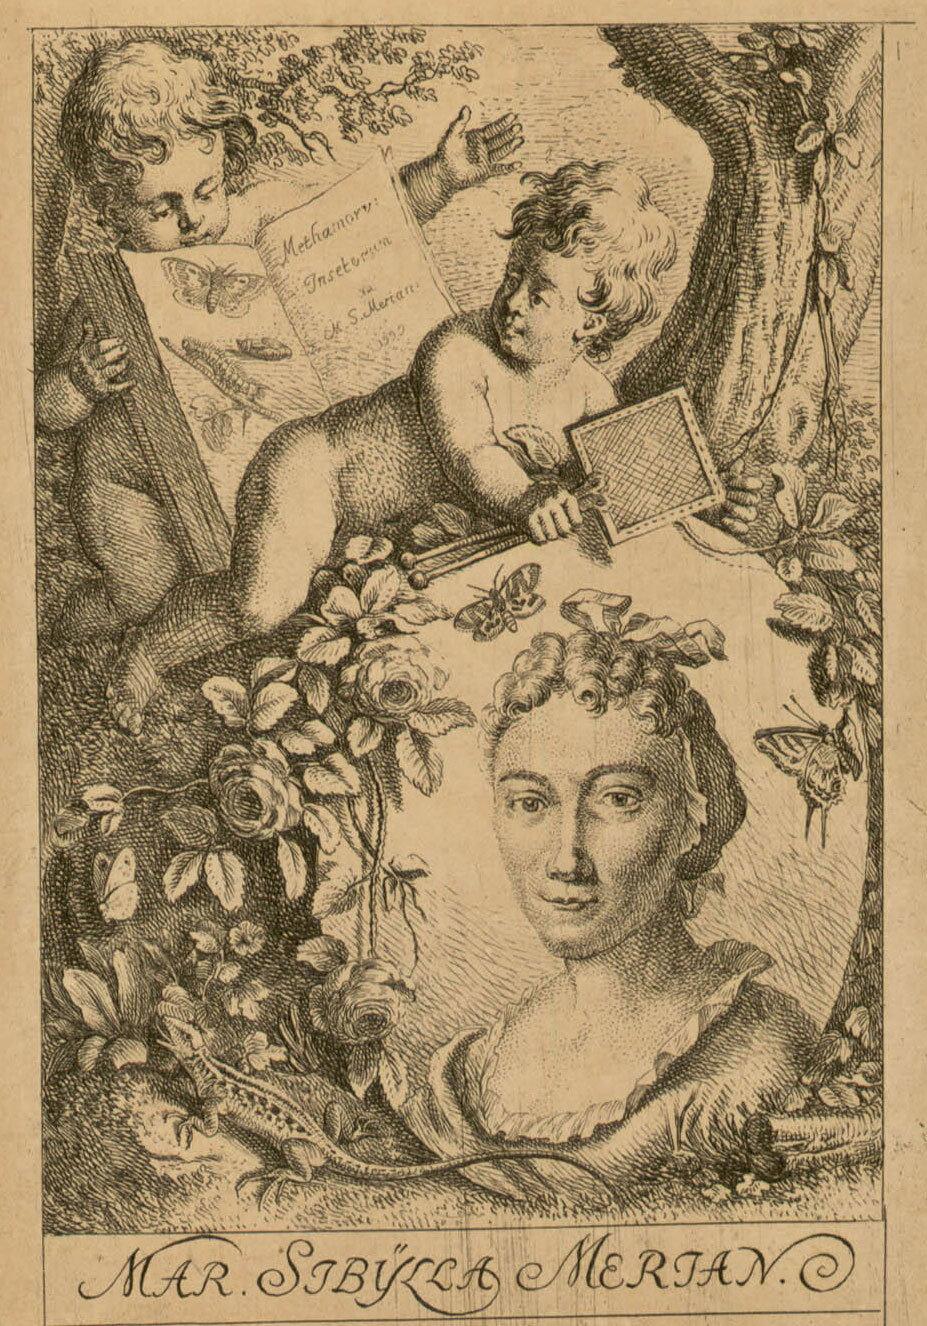 Portrait of Maria Sibÿlla Merian, Johann Rudolf Schellenburg, Bibliothèque de l'INHA, Public Domain Mark